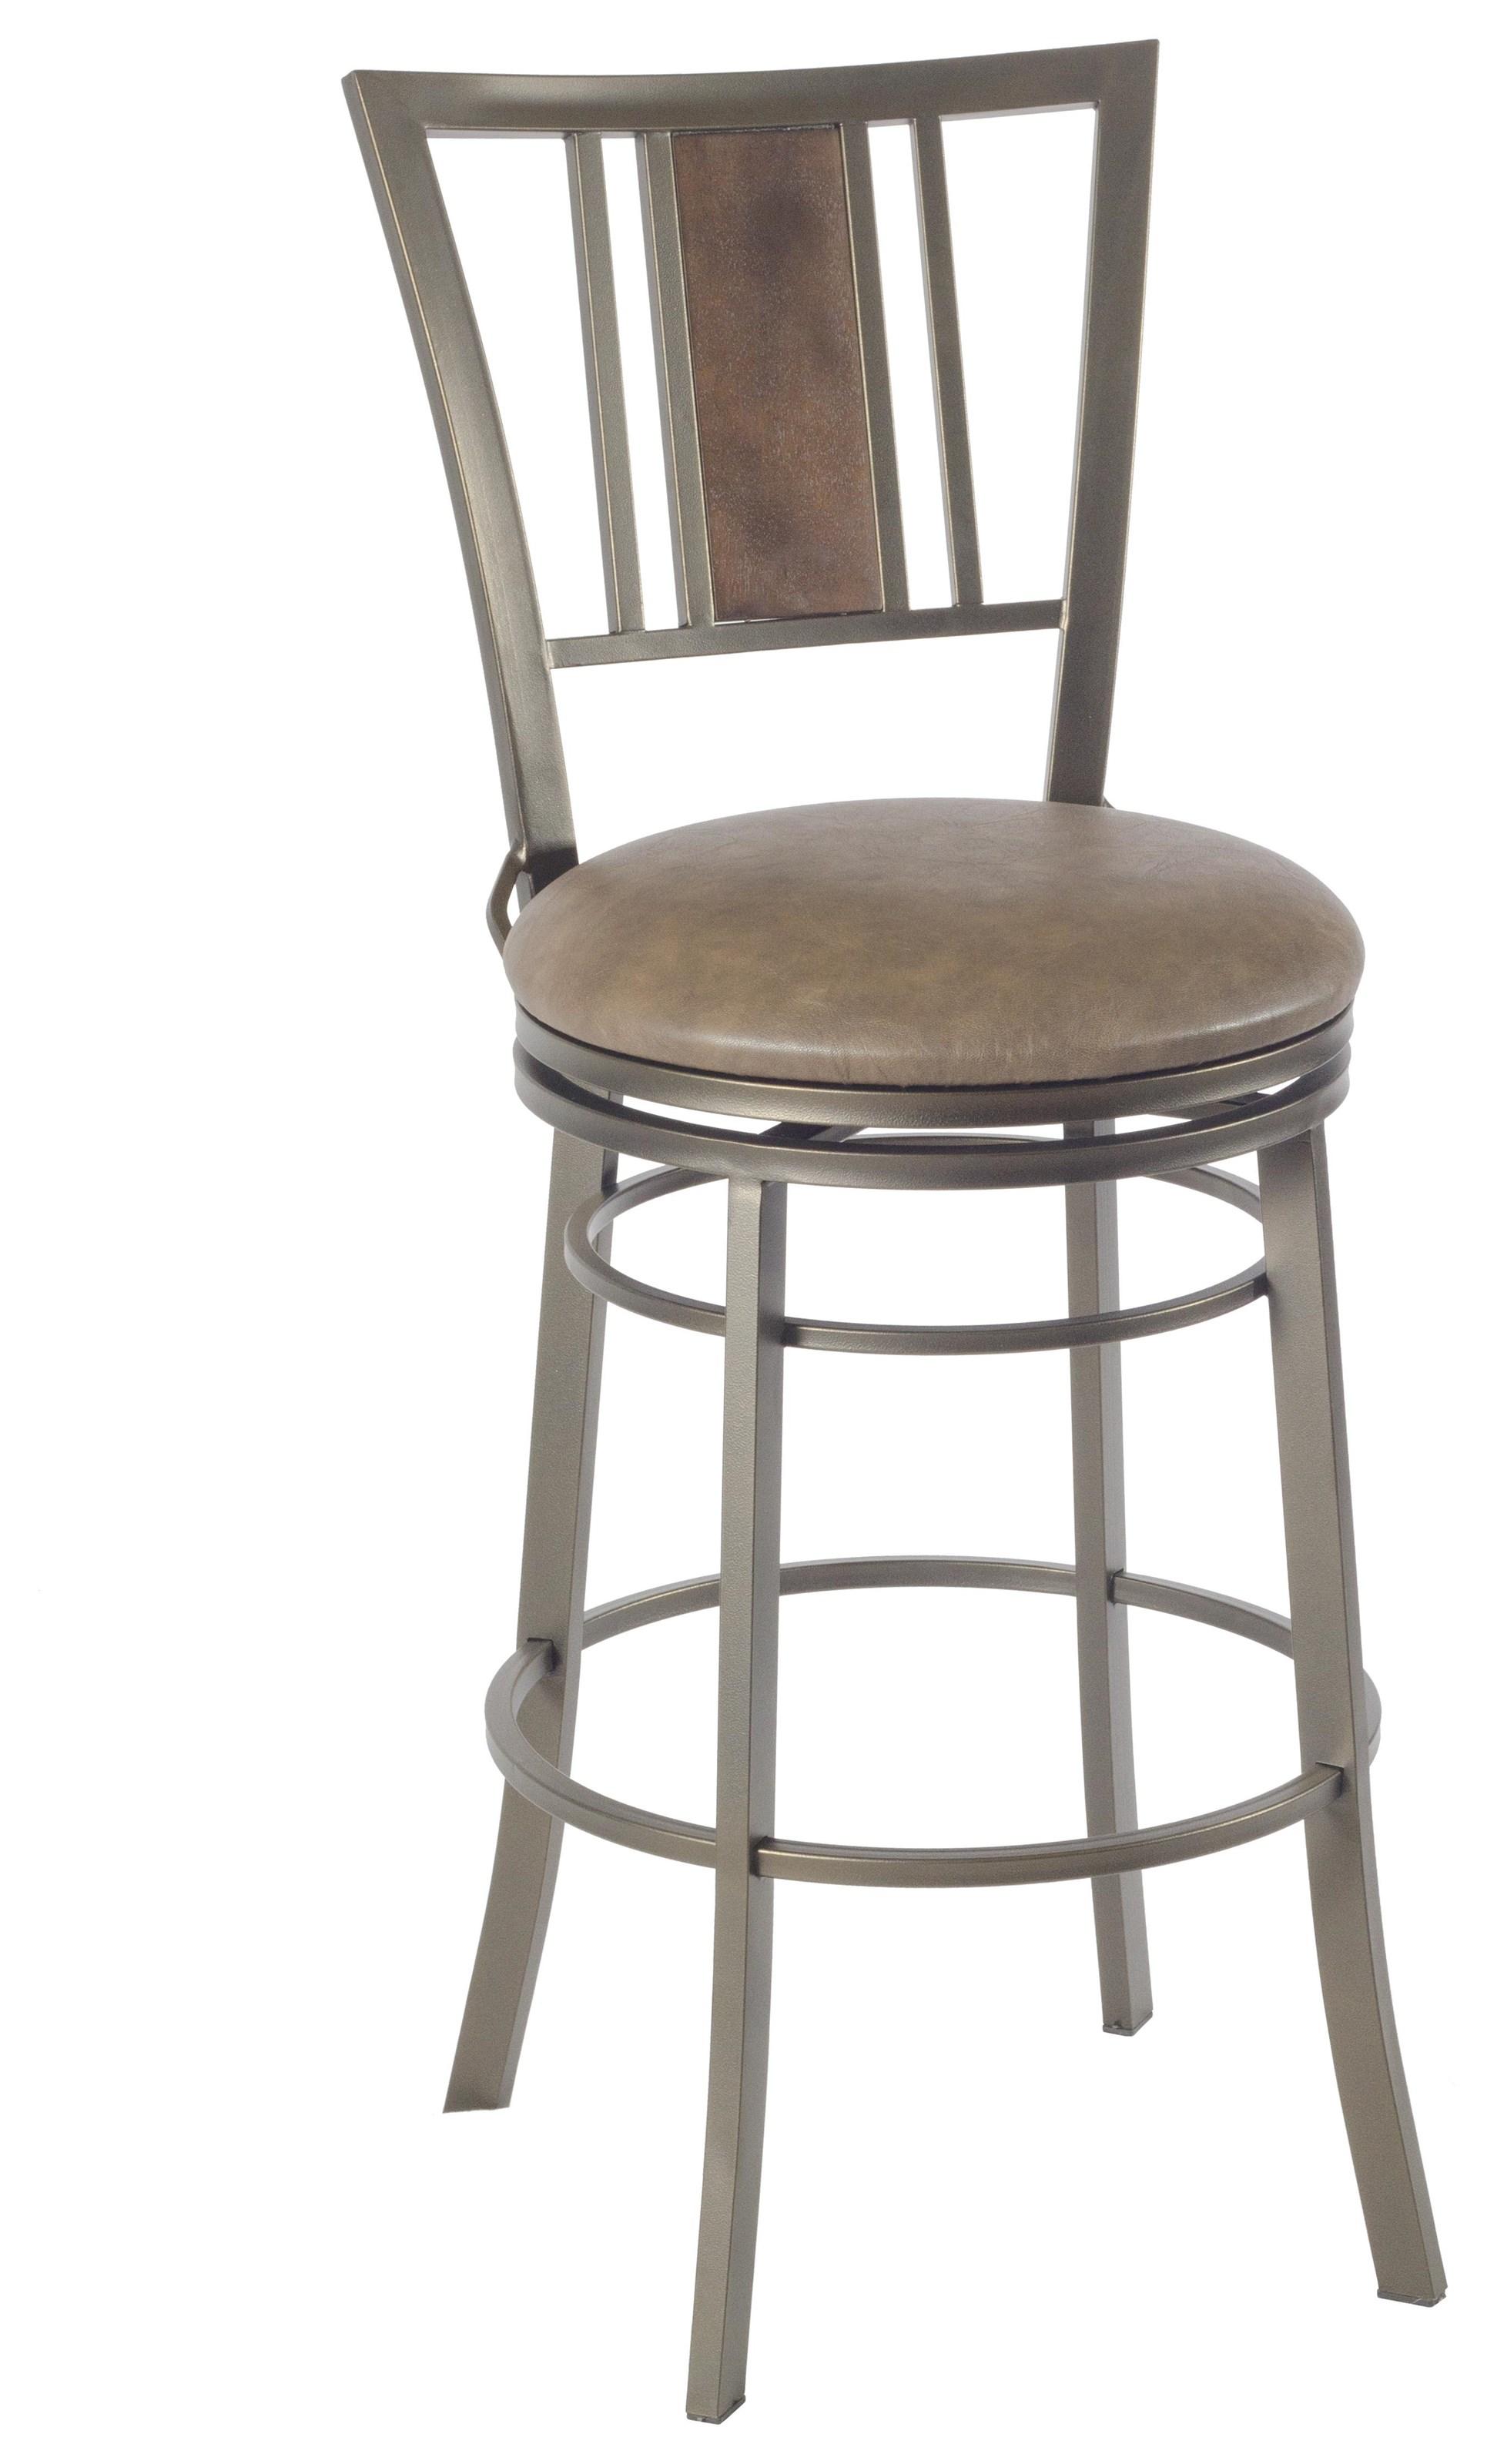 Trendy  celine counter height bar stool at Walker's Furniture